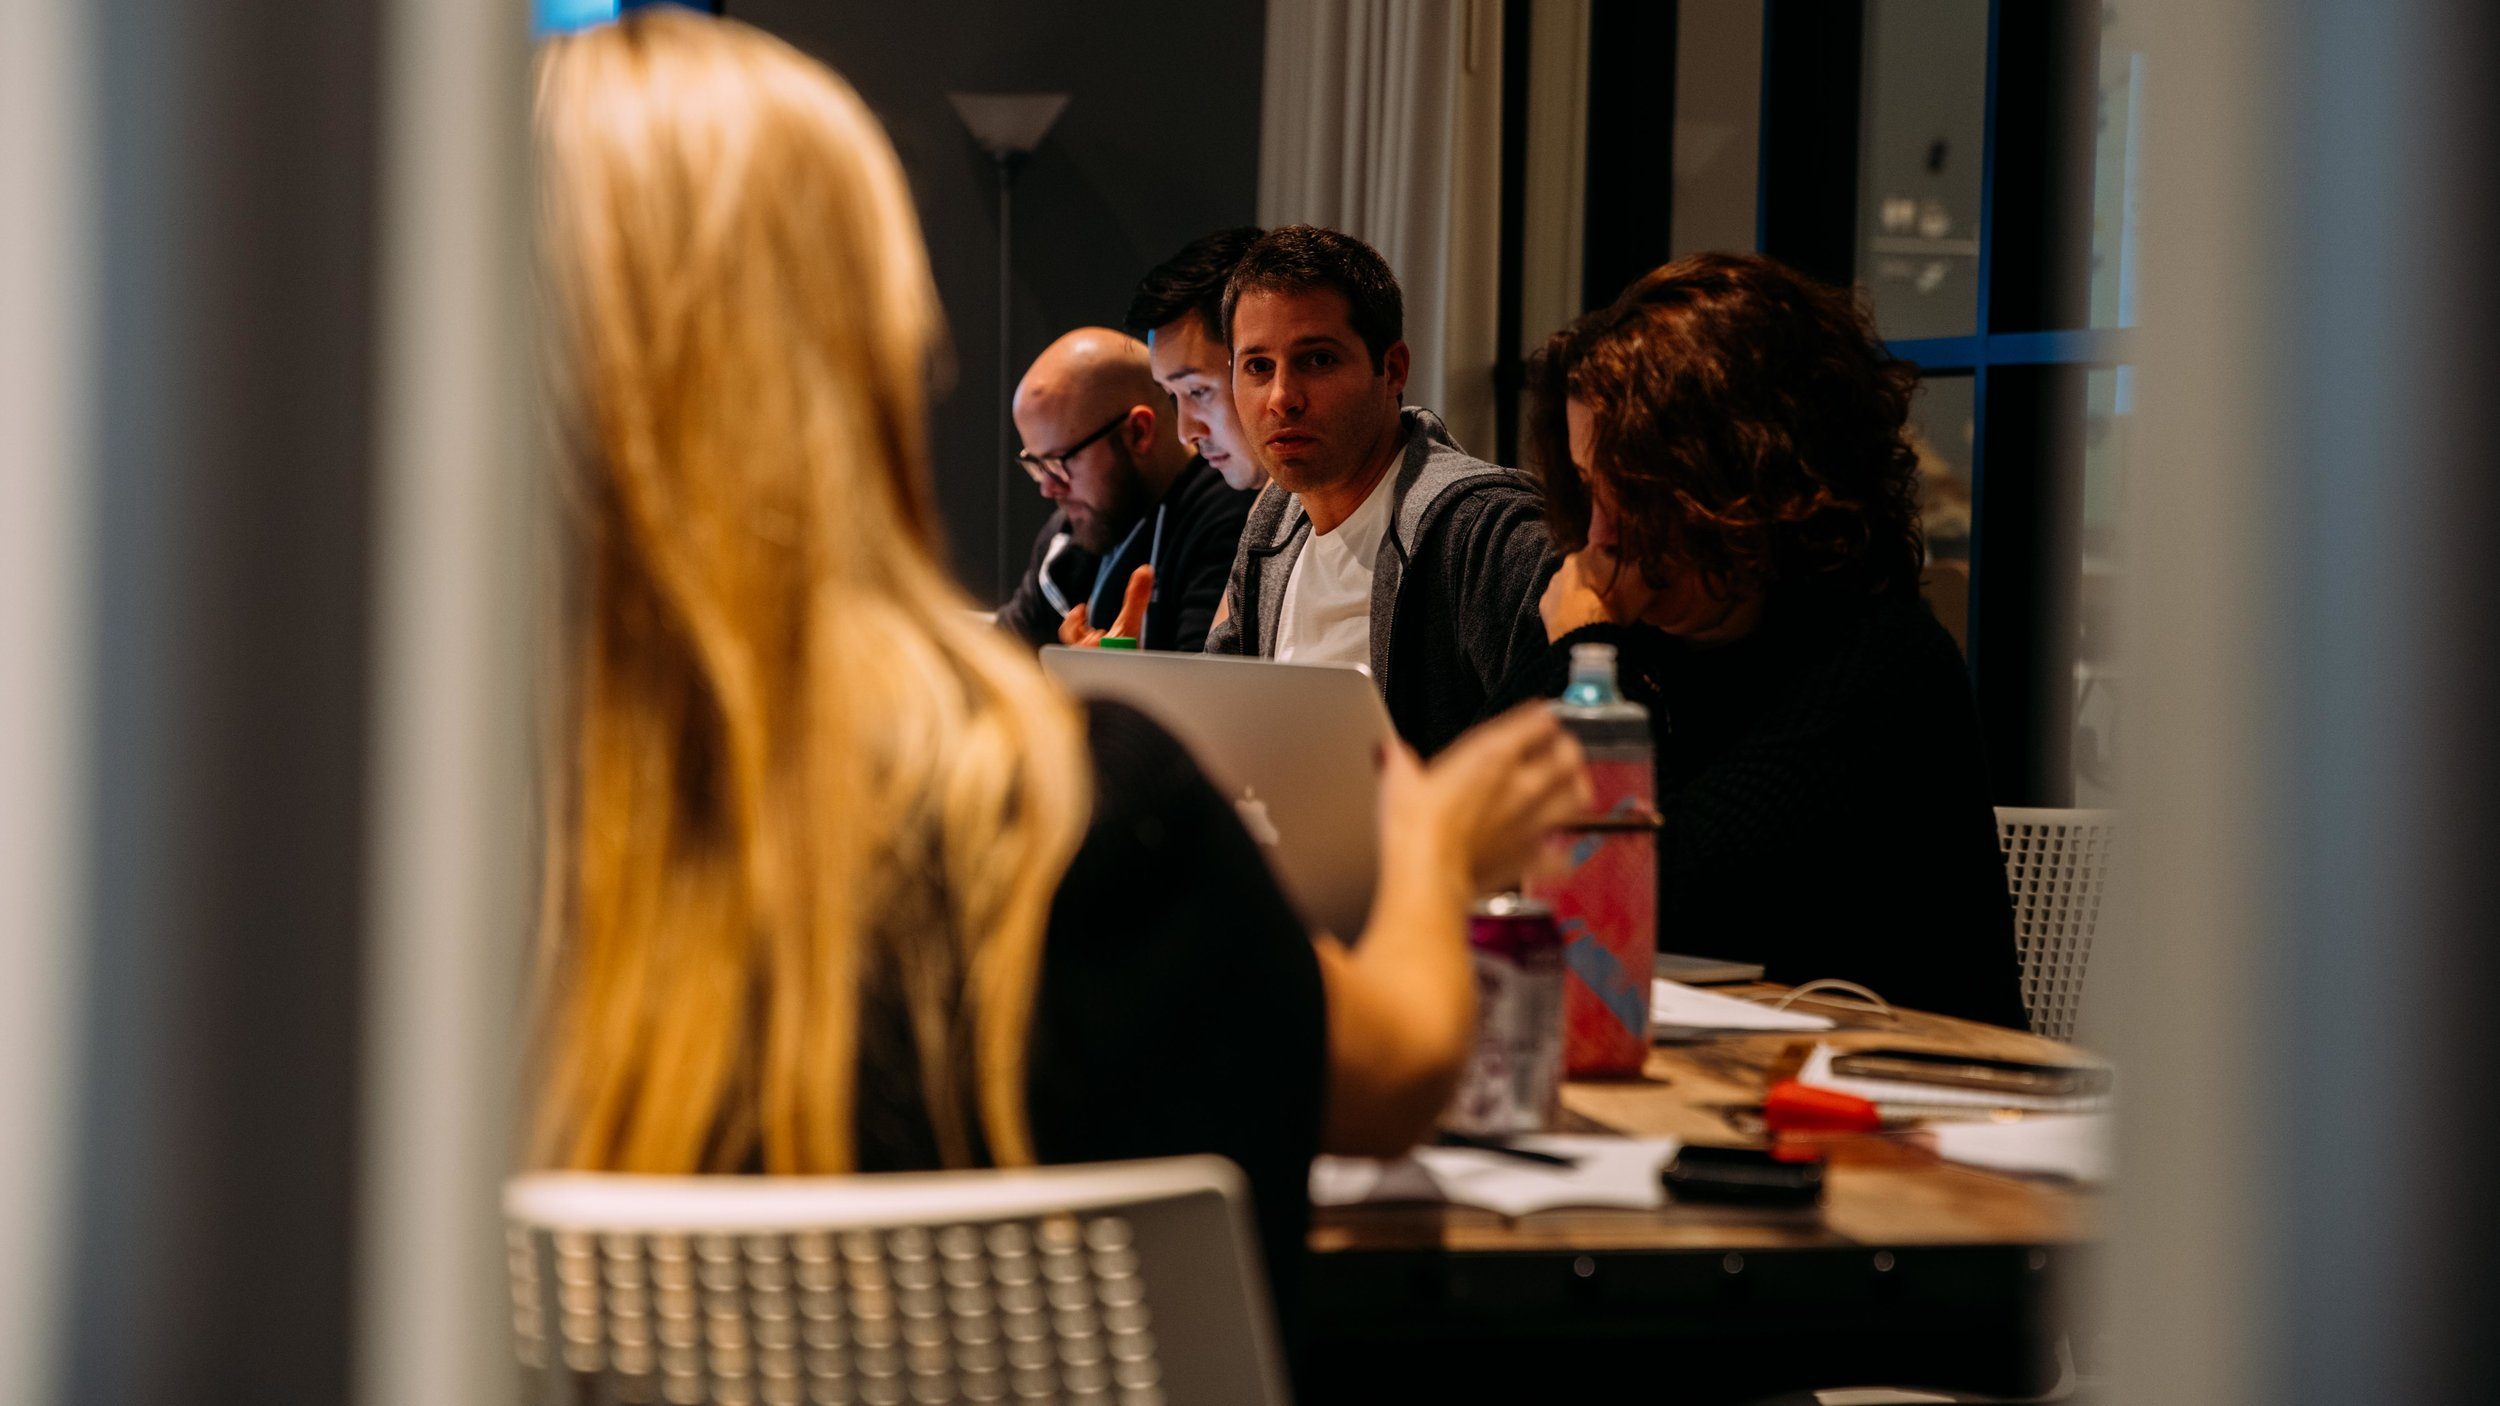 founders-nov-2-third-19.jpg